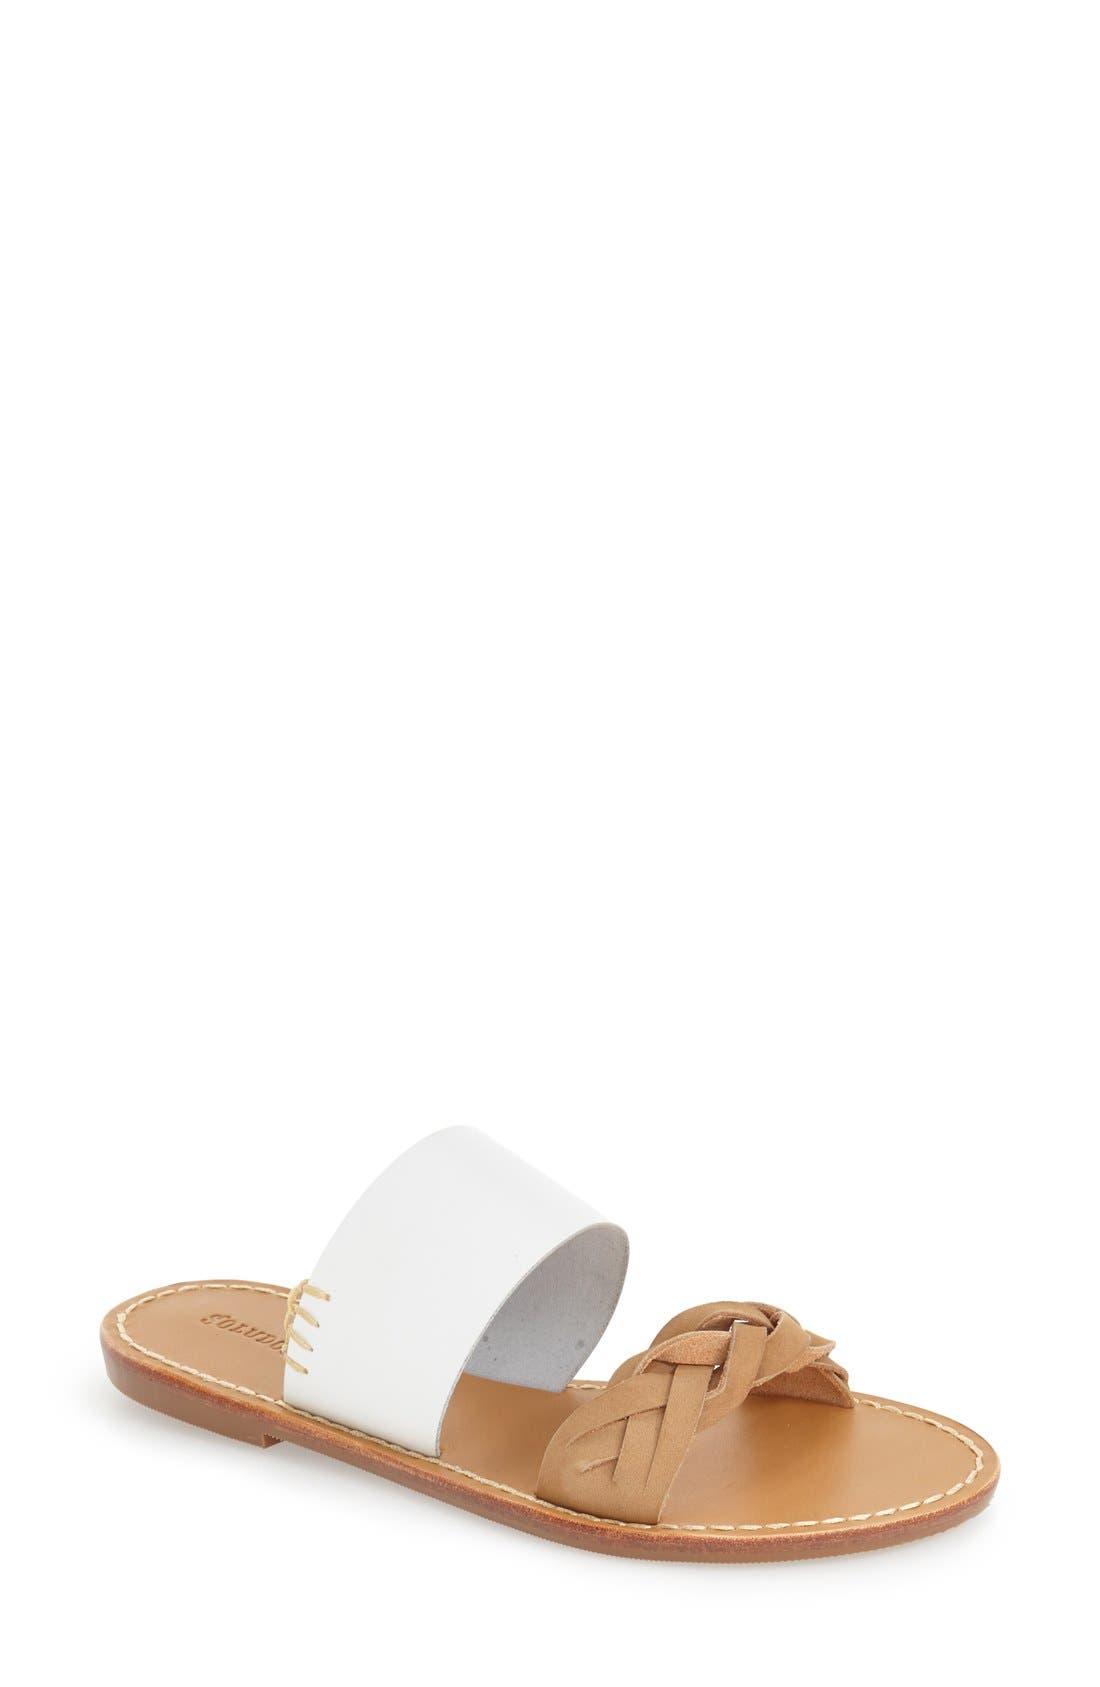 Slide Sandal,                         Main,                         color, WHITE LEATHER